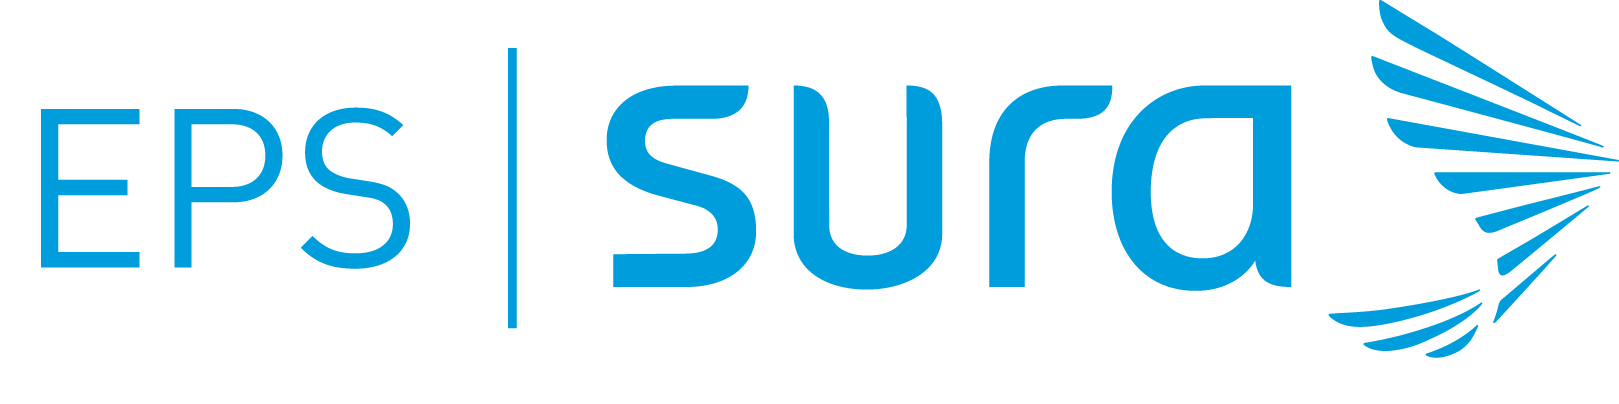 logosEpsSura